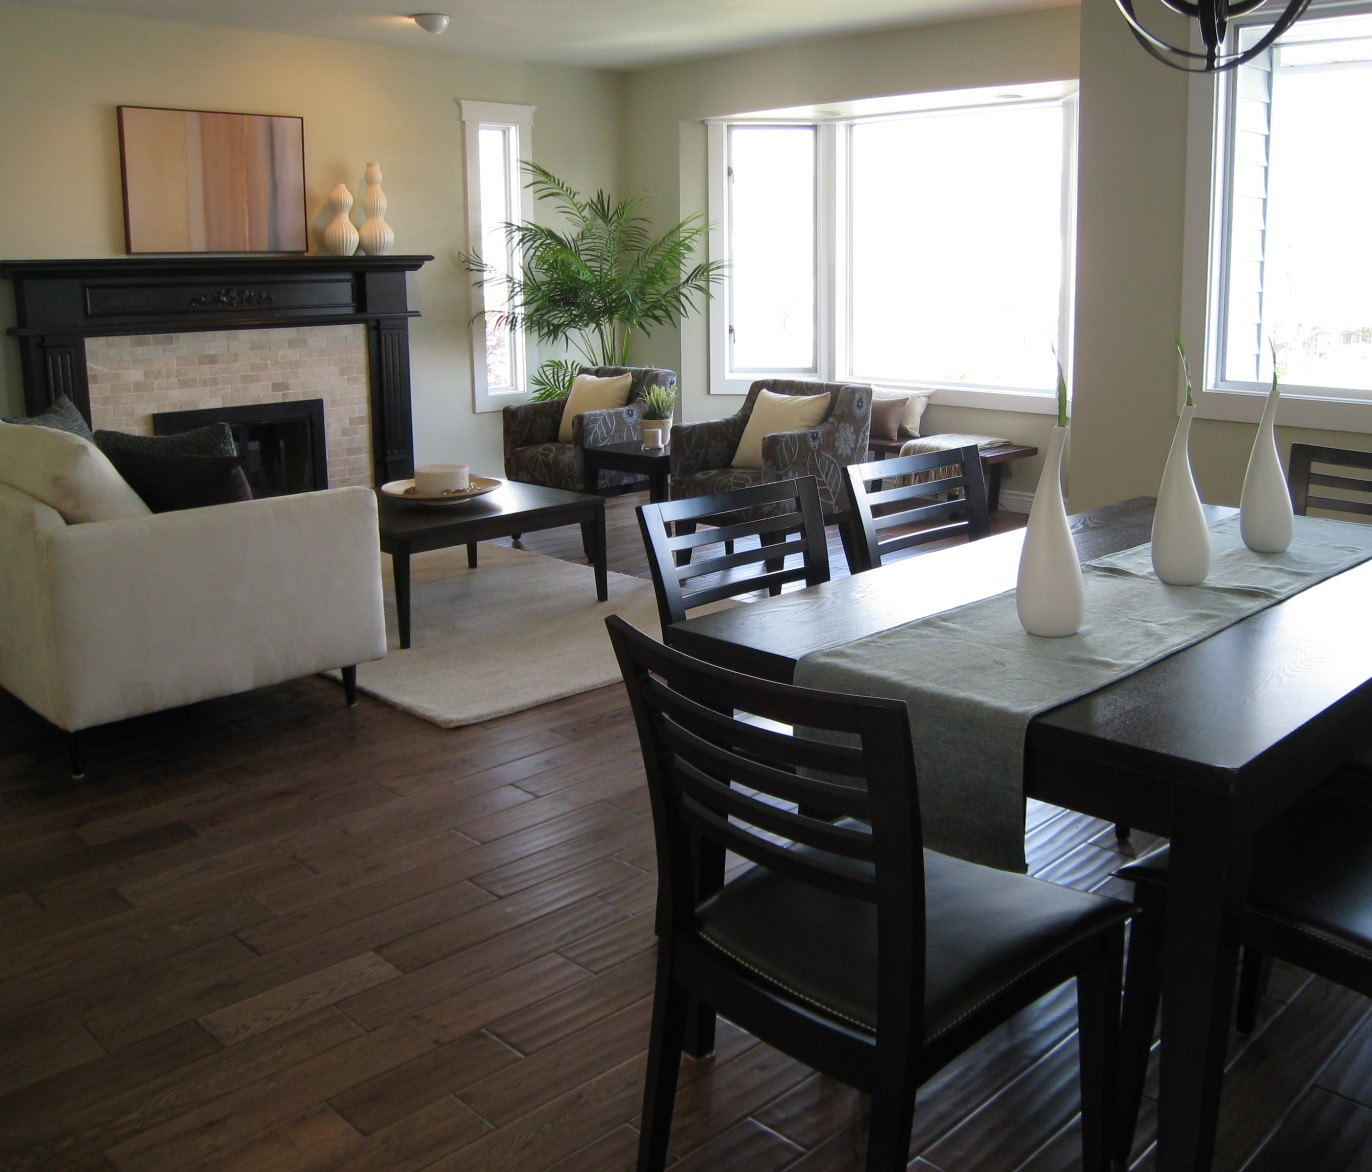 Renovation Rumble Kitchen: Successful Renovation Planning